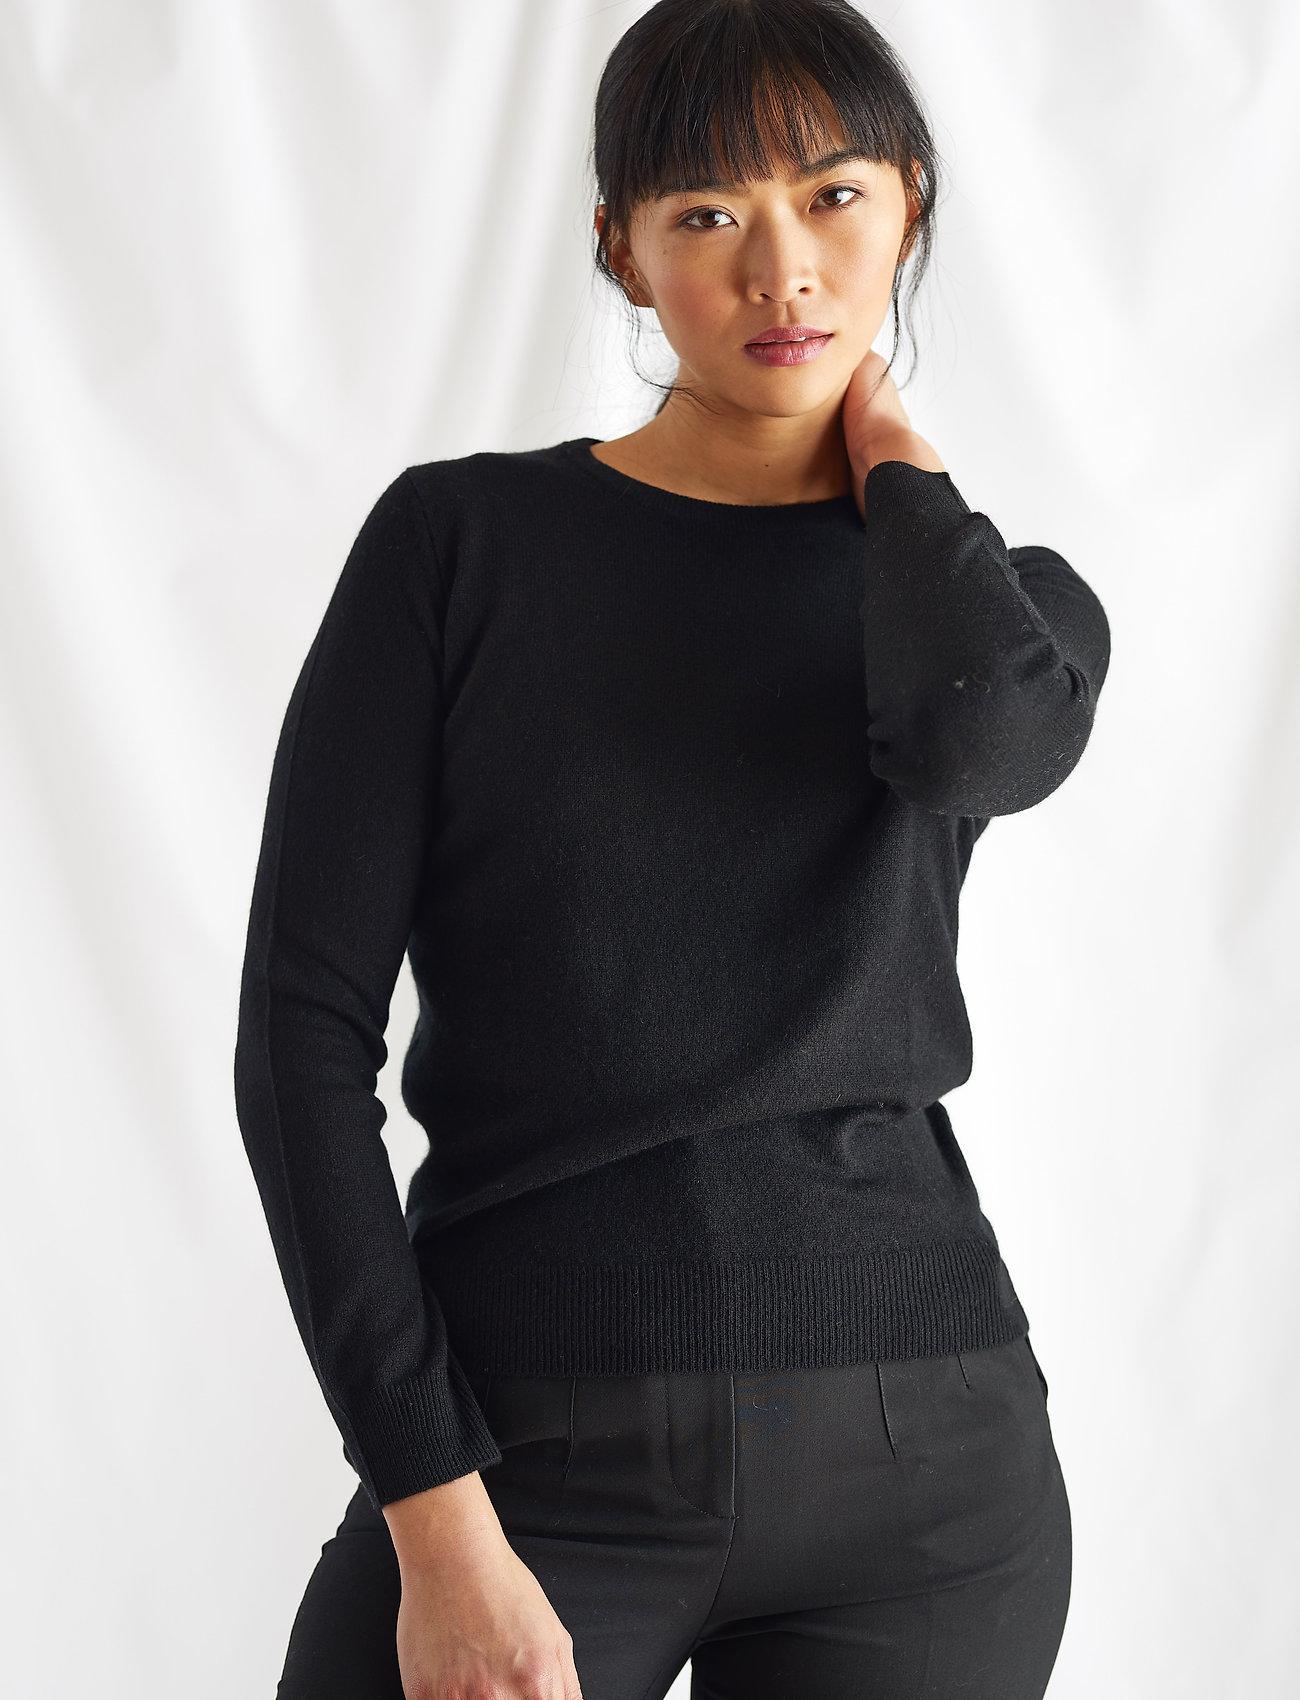 Davida Cashmere - Basic sweater - sweaters - black - 0